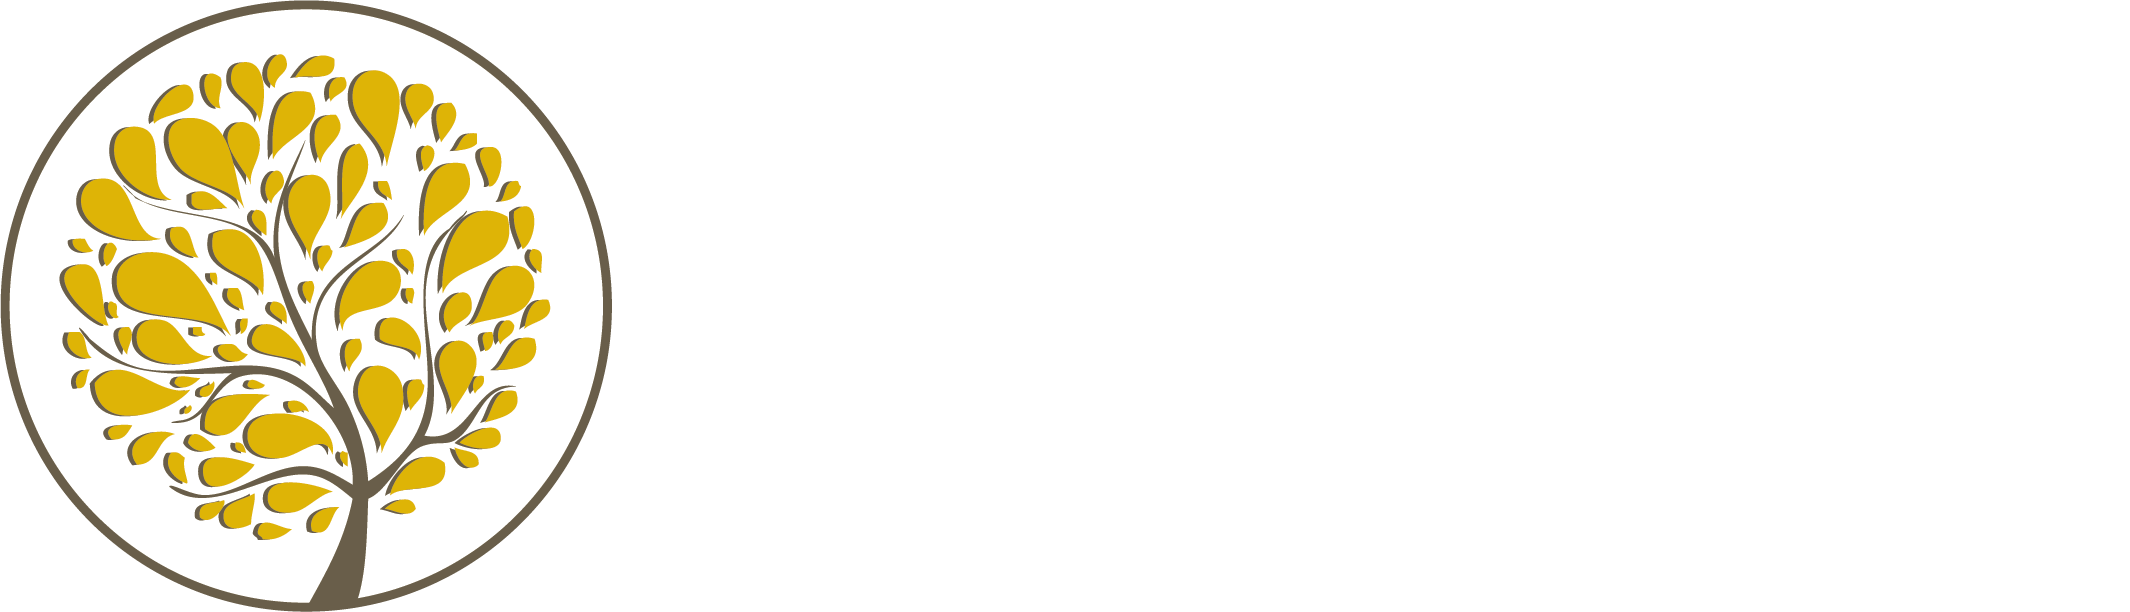 Creekside - Creekside Health & Rehabilitation Center